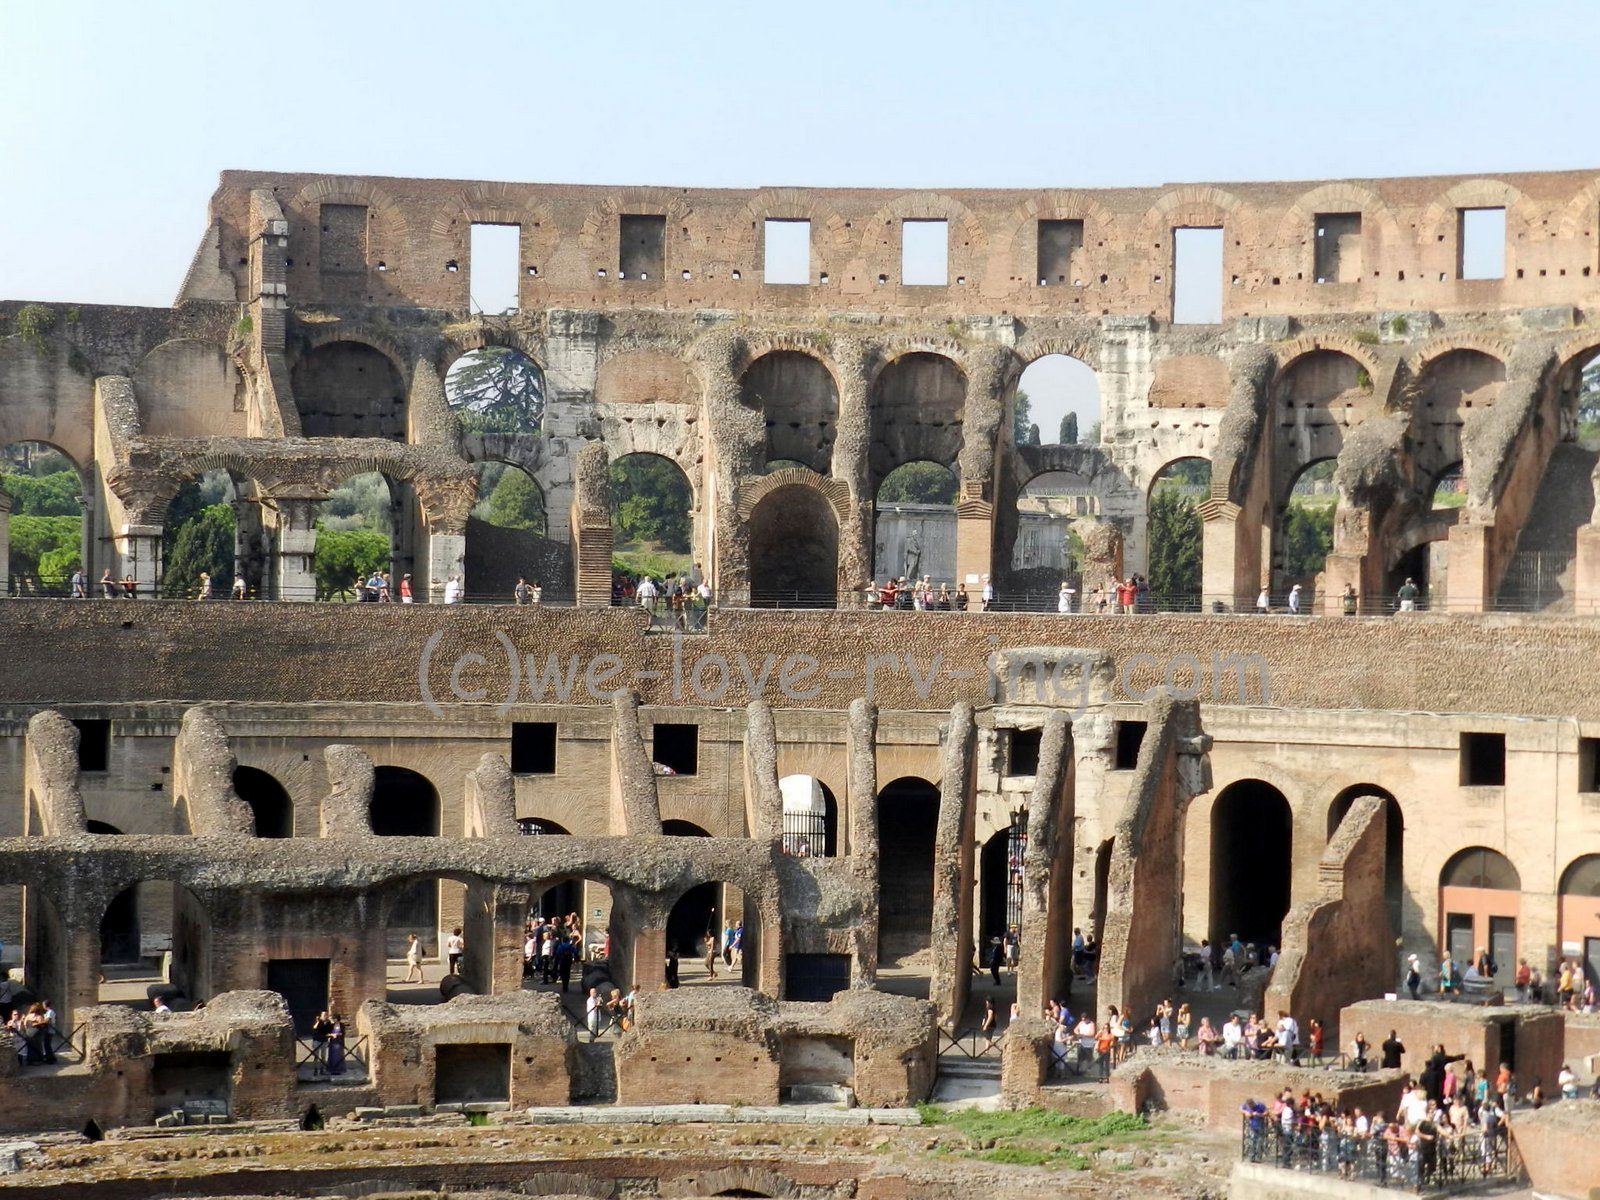 We Love RV'ing: Colosseum